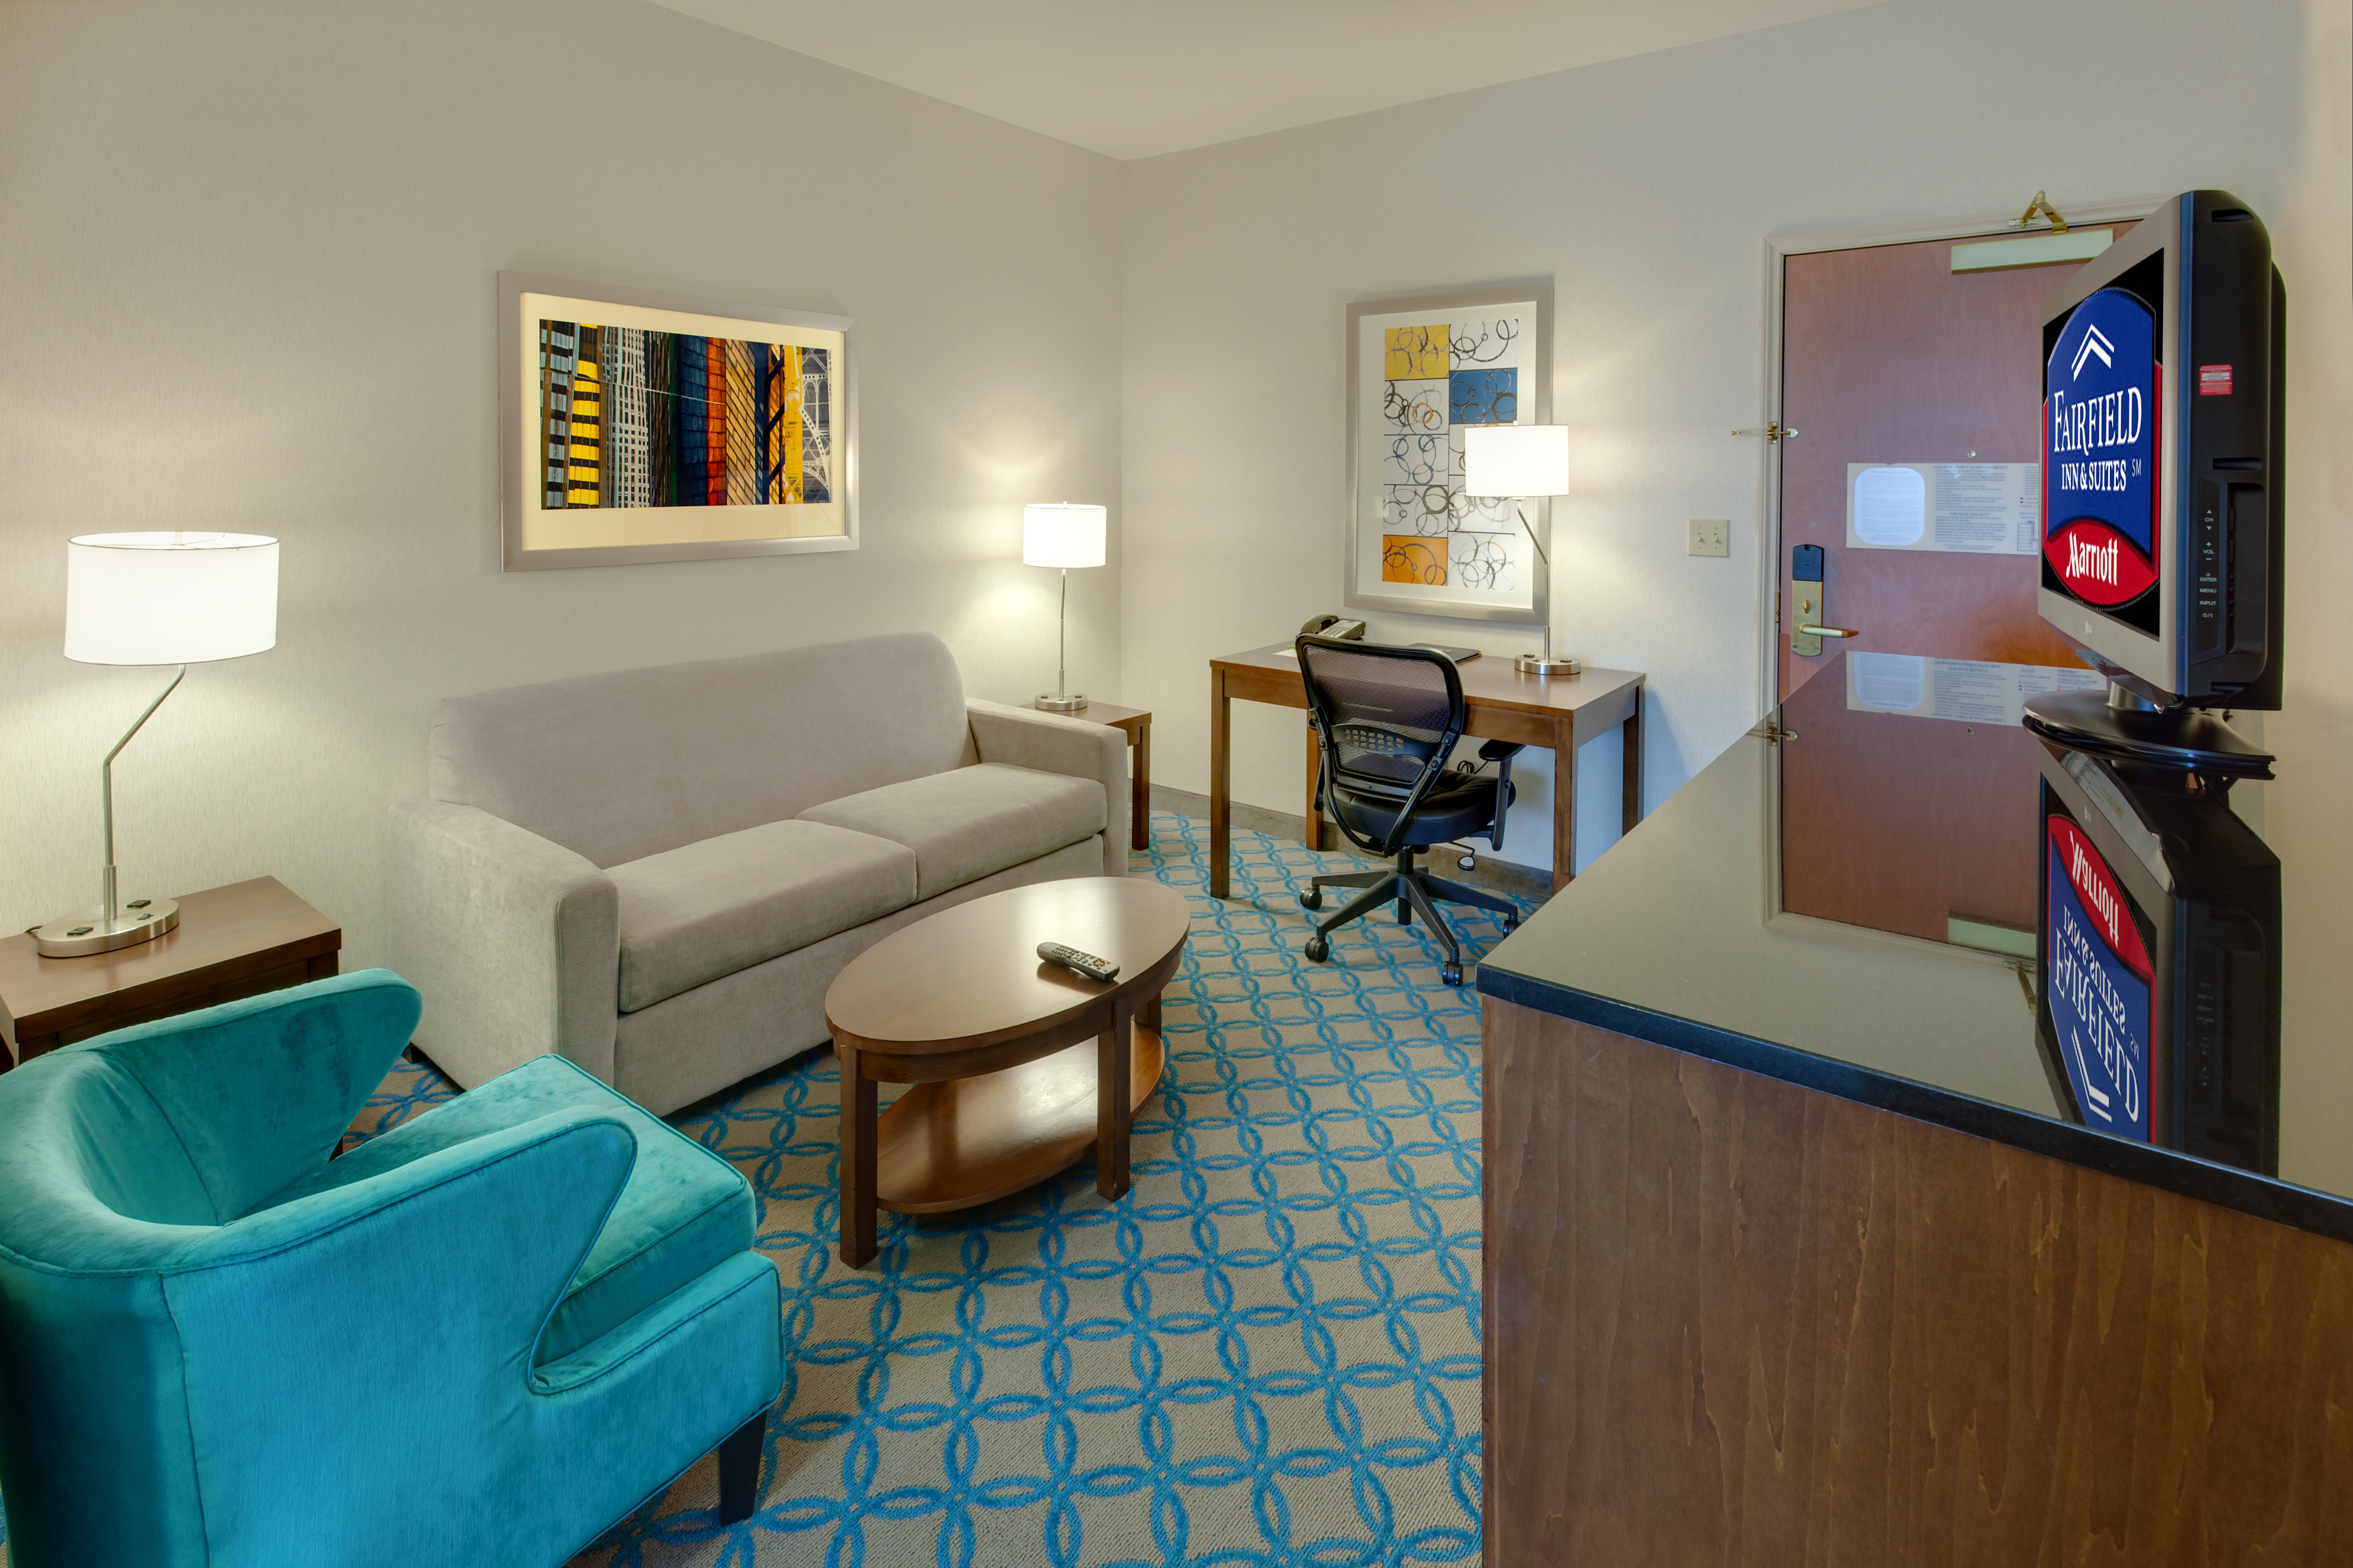 https://www.hotelsbyday.com/_data/default-hotel_image/1/6275/sfome-standard-room-living-area.jpg